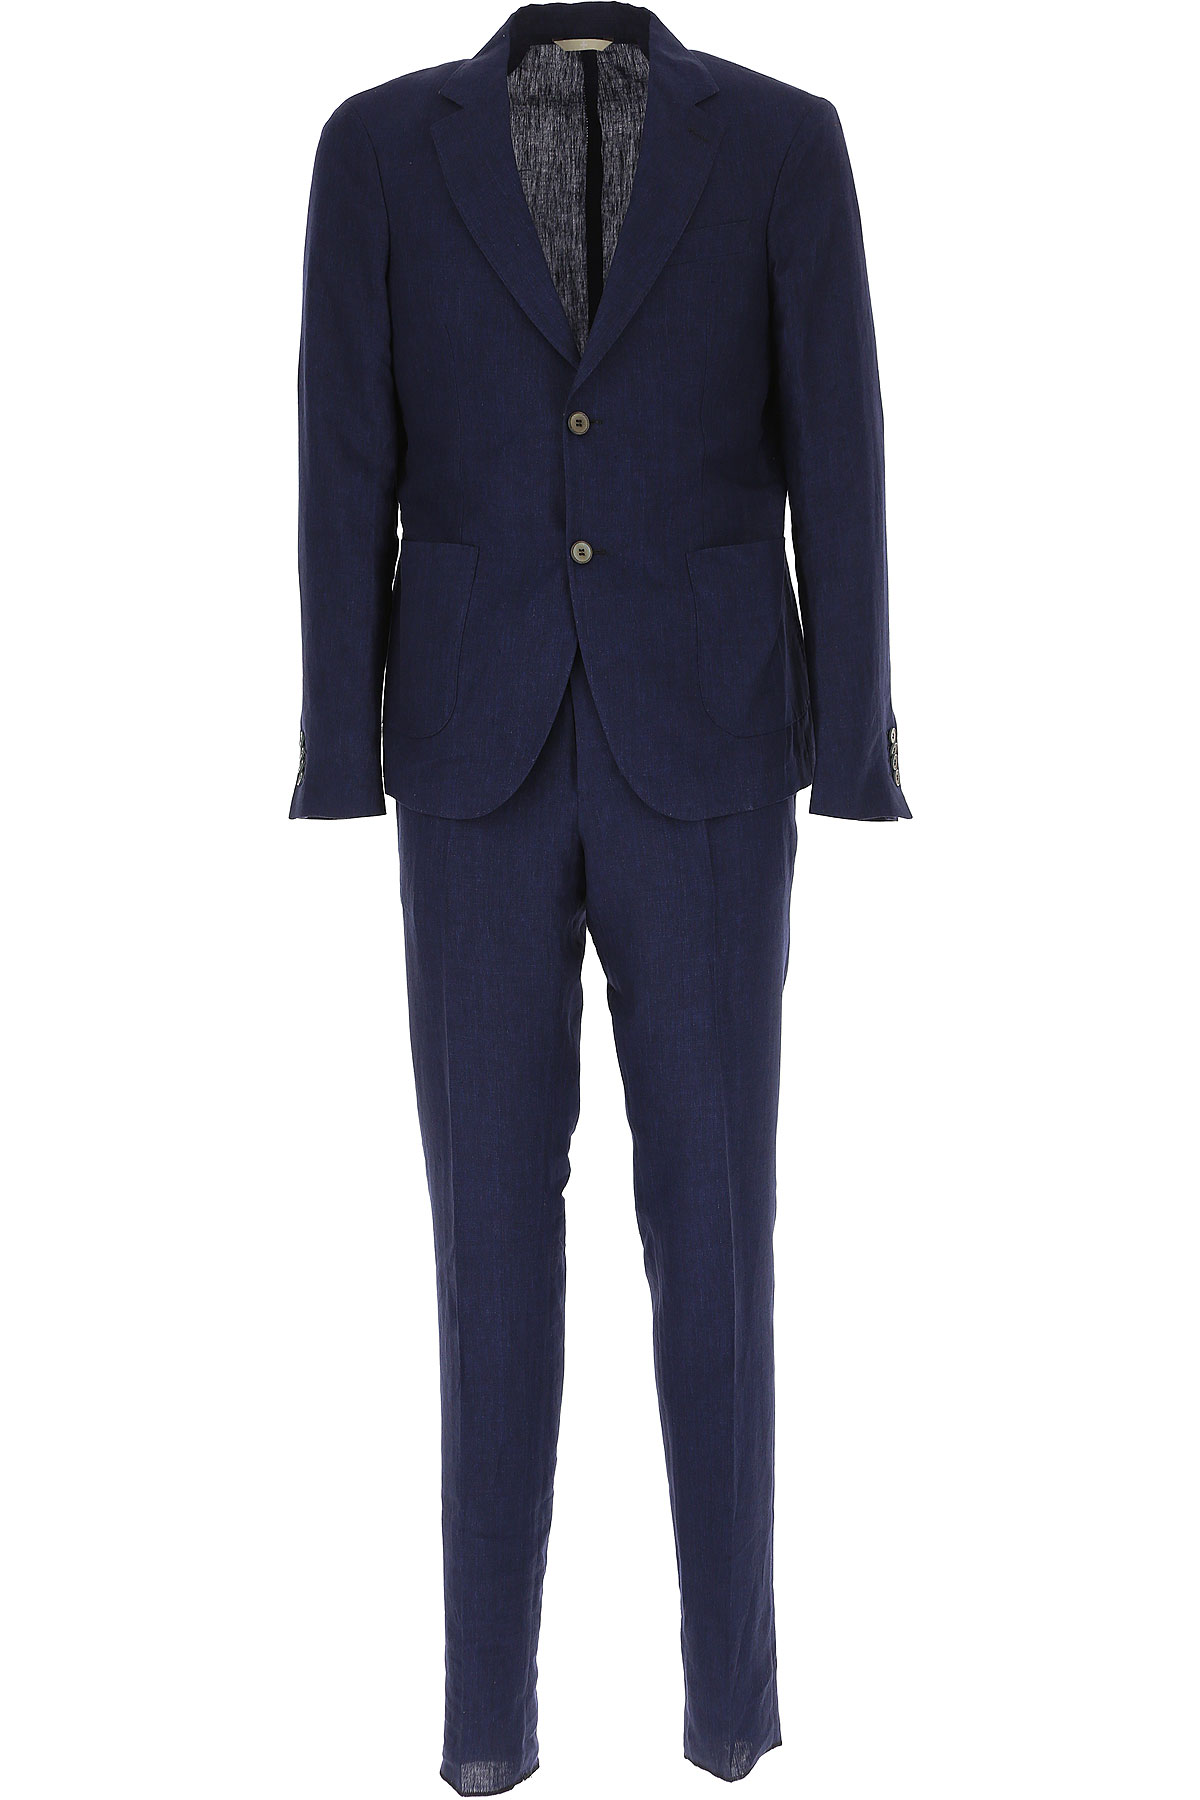 Simbols Men's Suit, Midnight, linen, 2019, XL XXL